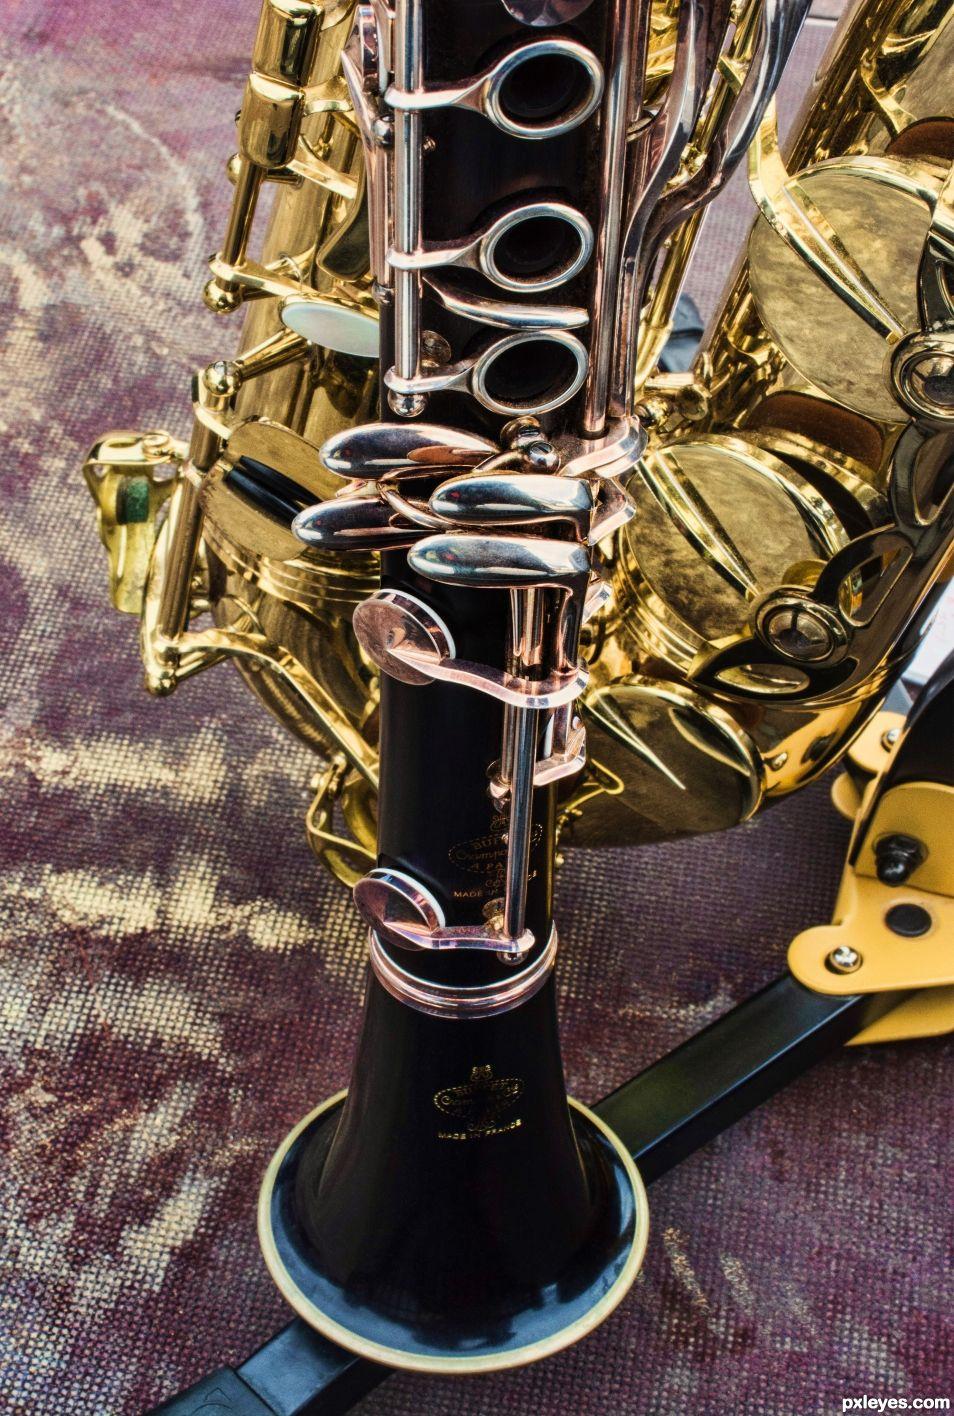 Buffet-Crampon clarinet